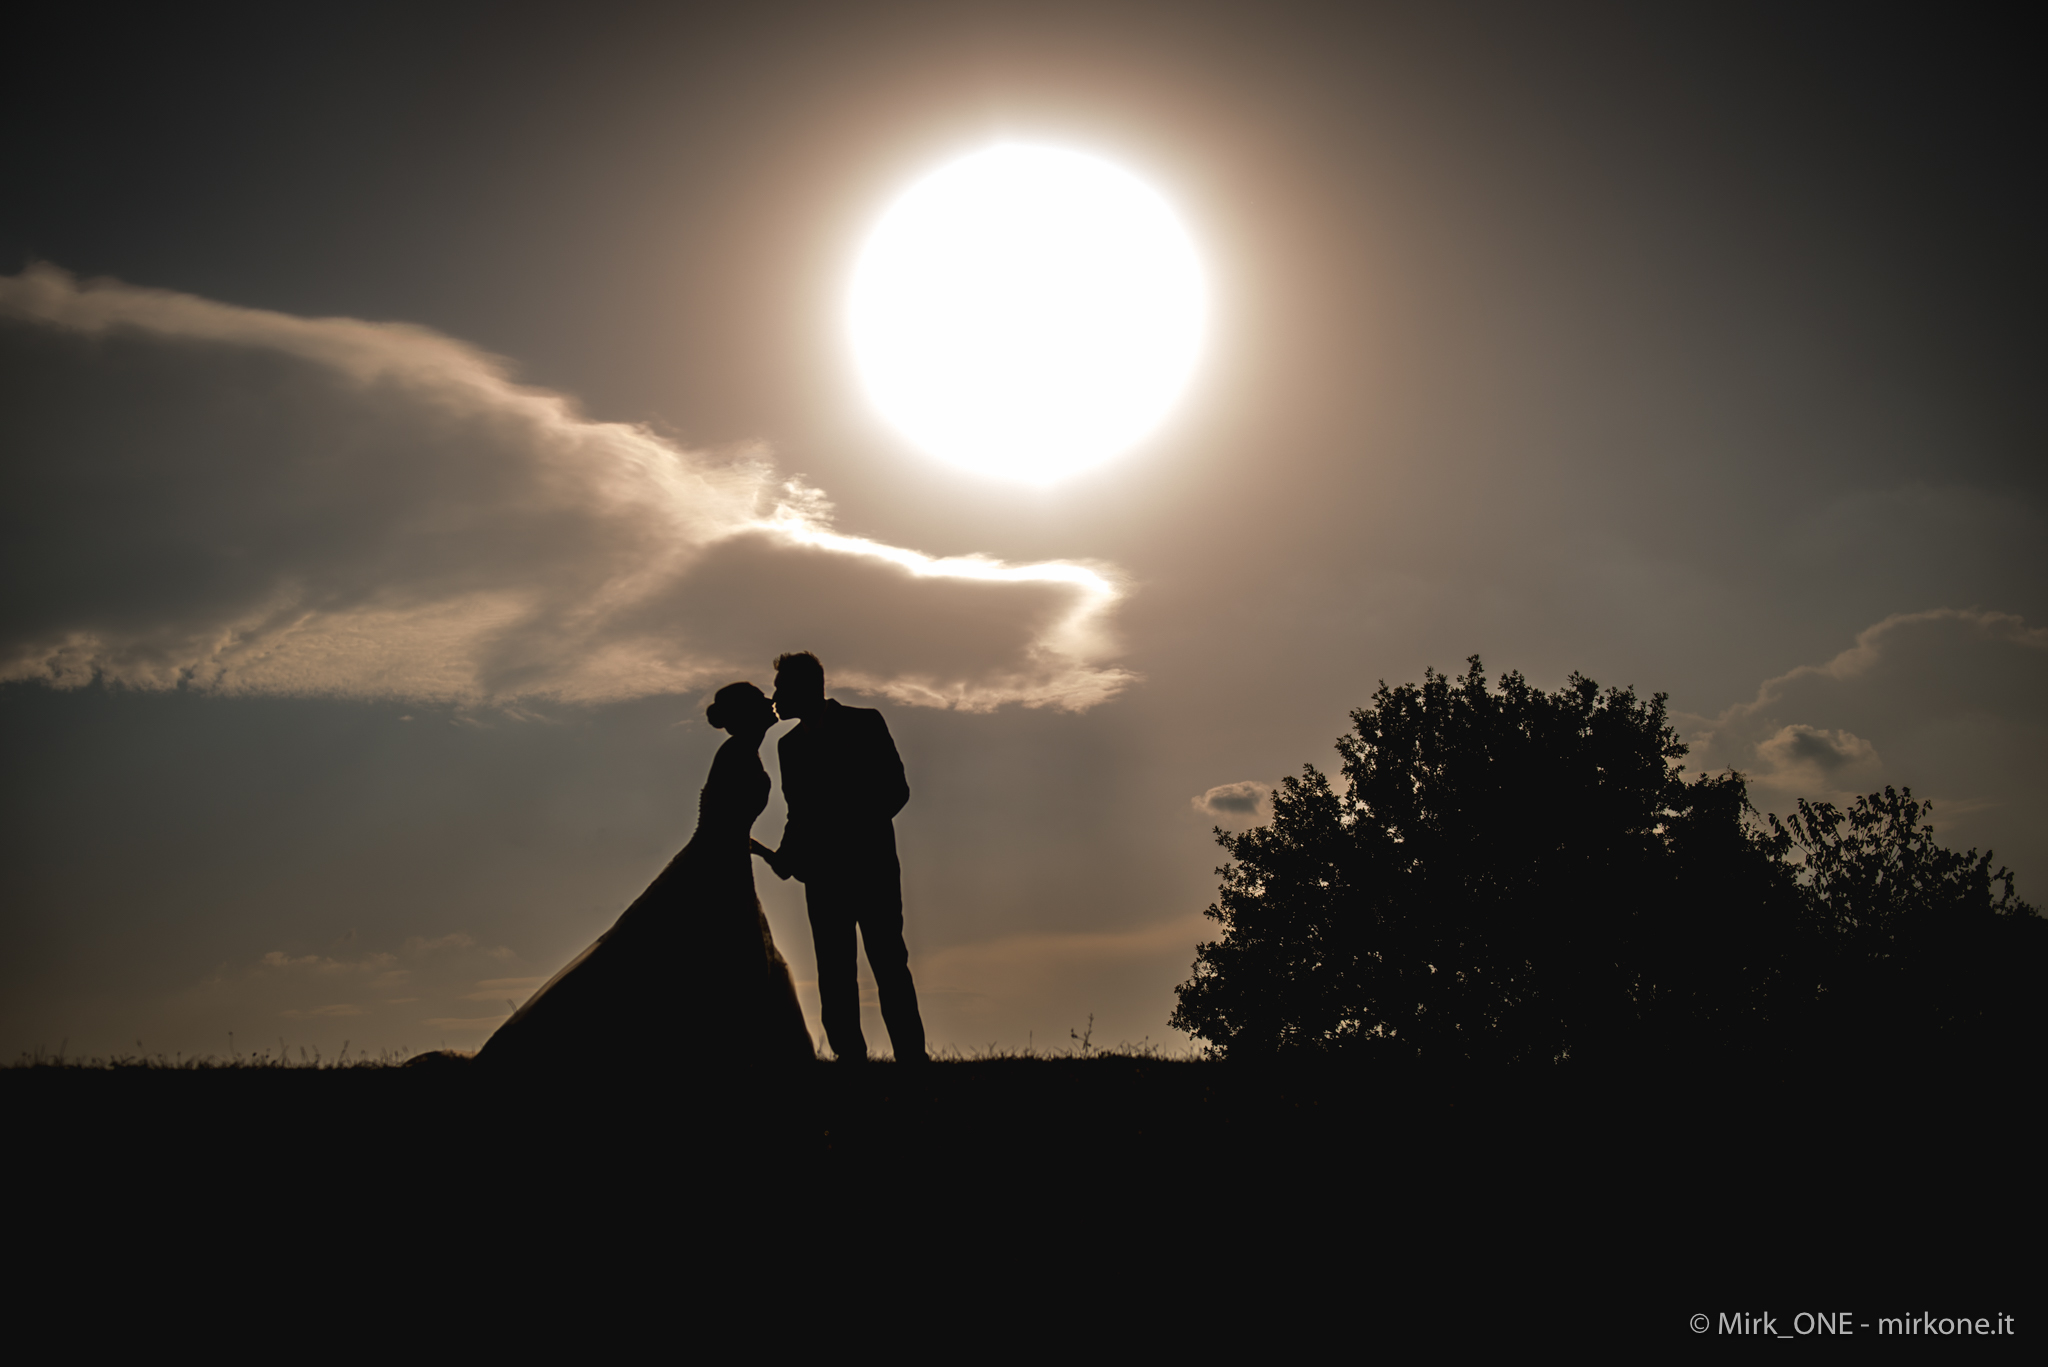 https://lnx.mirkone.it/wp-content/uploads/2015/07/mirk_ONE-fotografo-matrimonio-00839.jpg